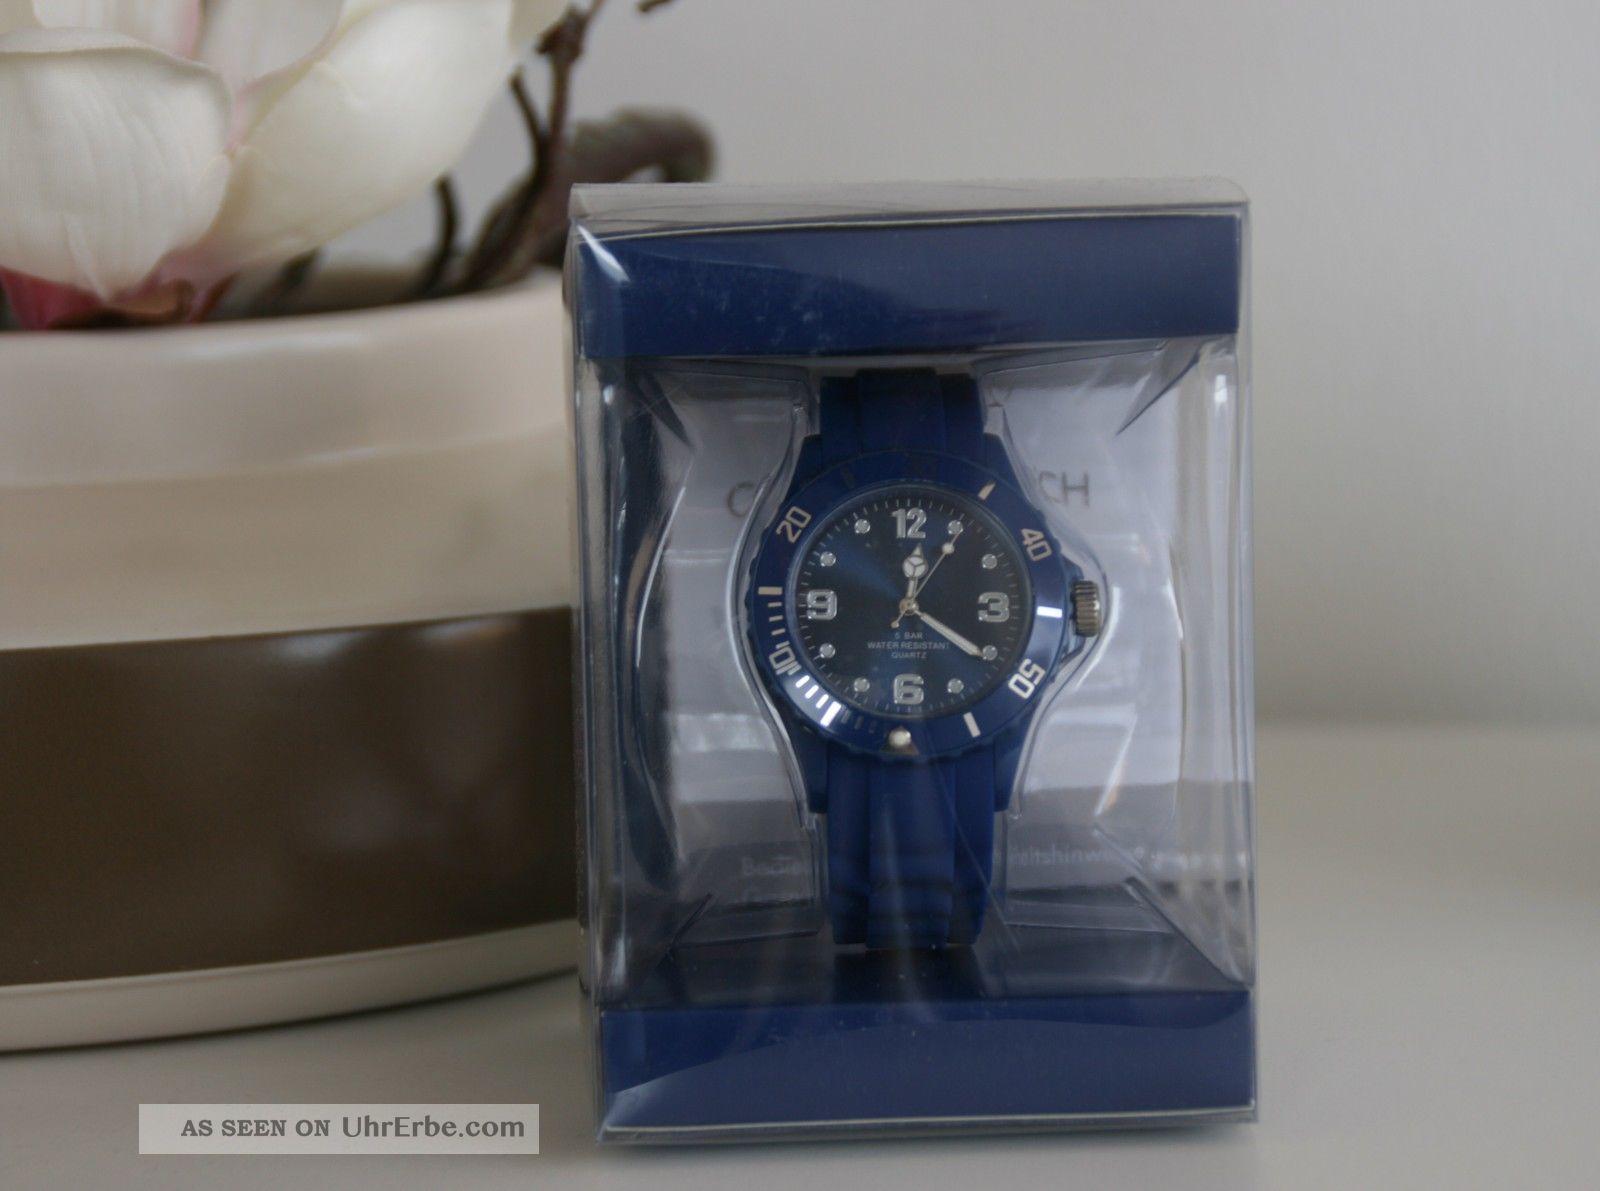 Colour Watch Coole Farbige Armband Uhr Blau - Mit Ovp Armbanduhren Bild